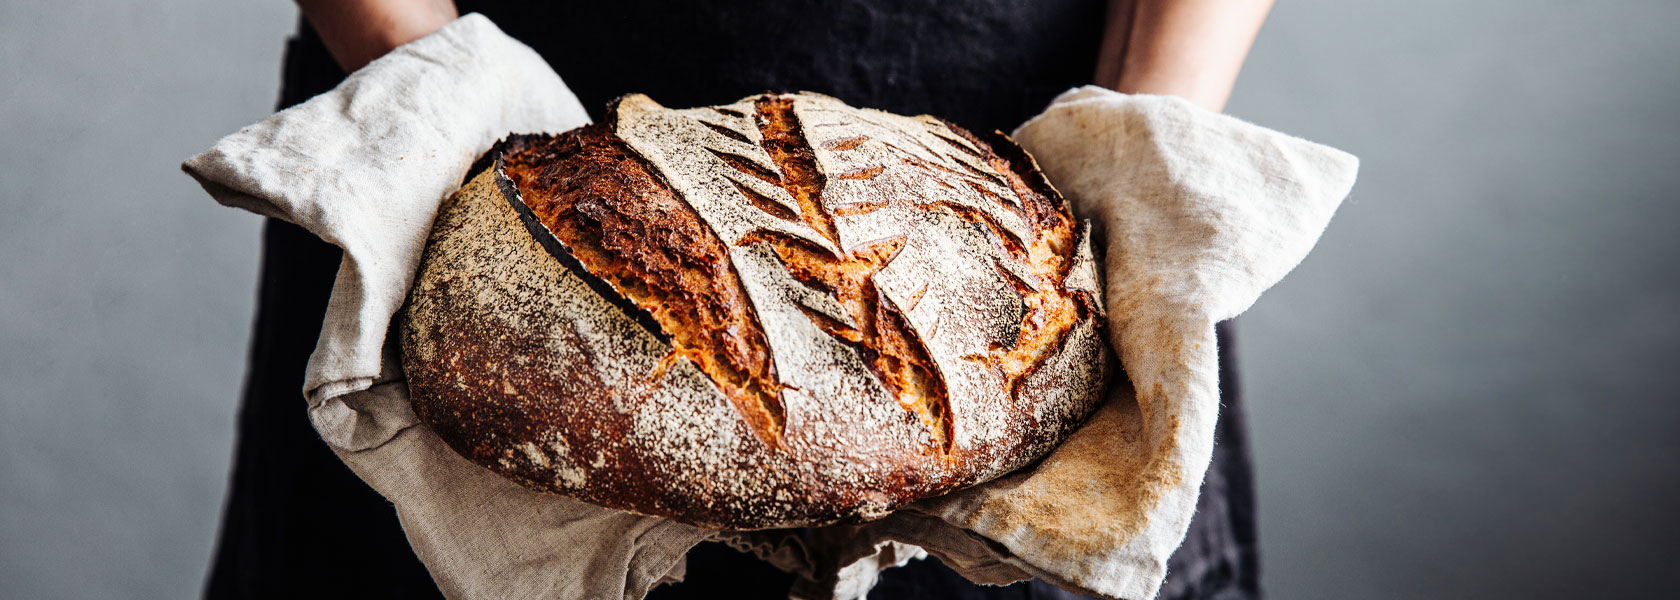 Rustic sourdough loaf of bread